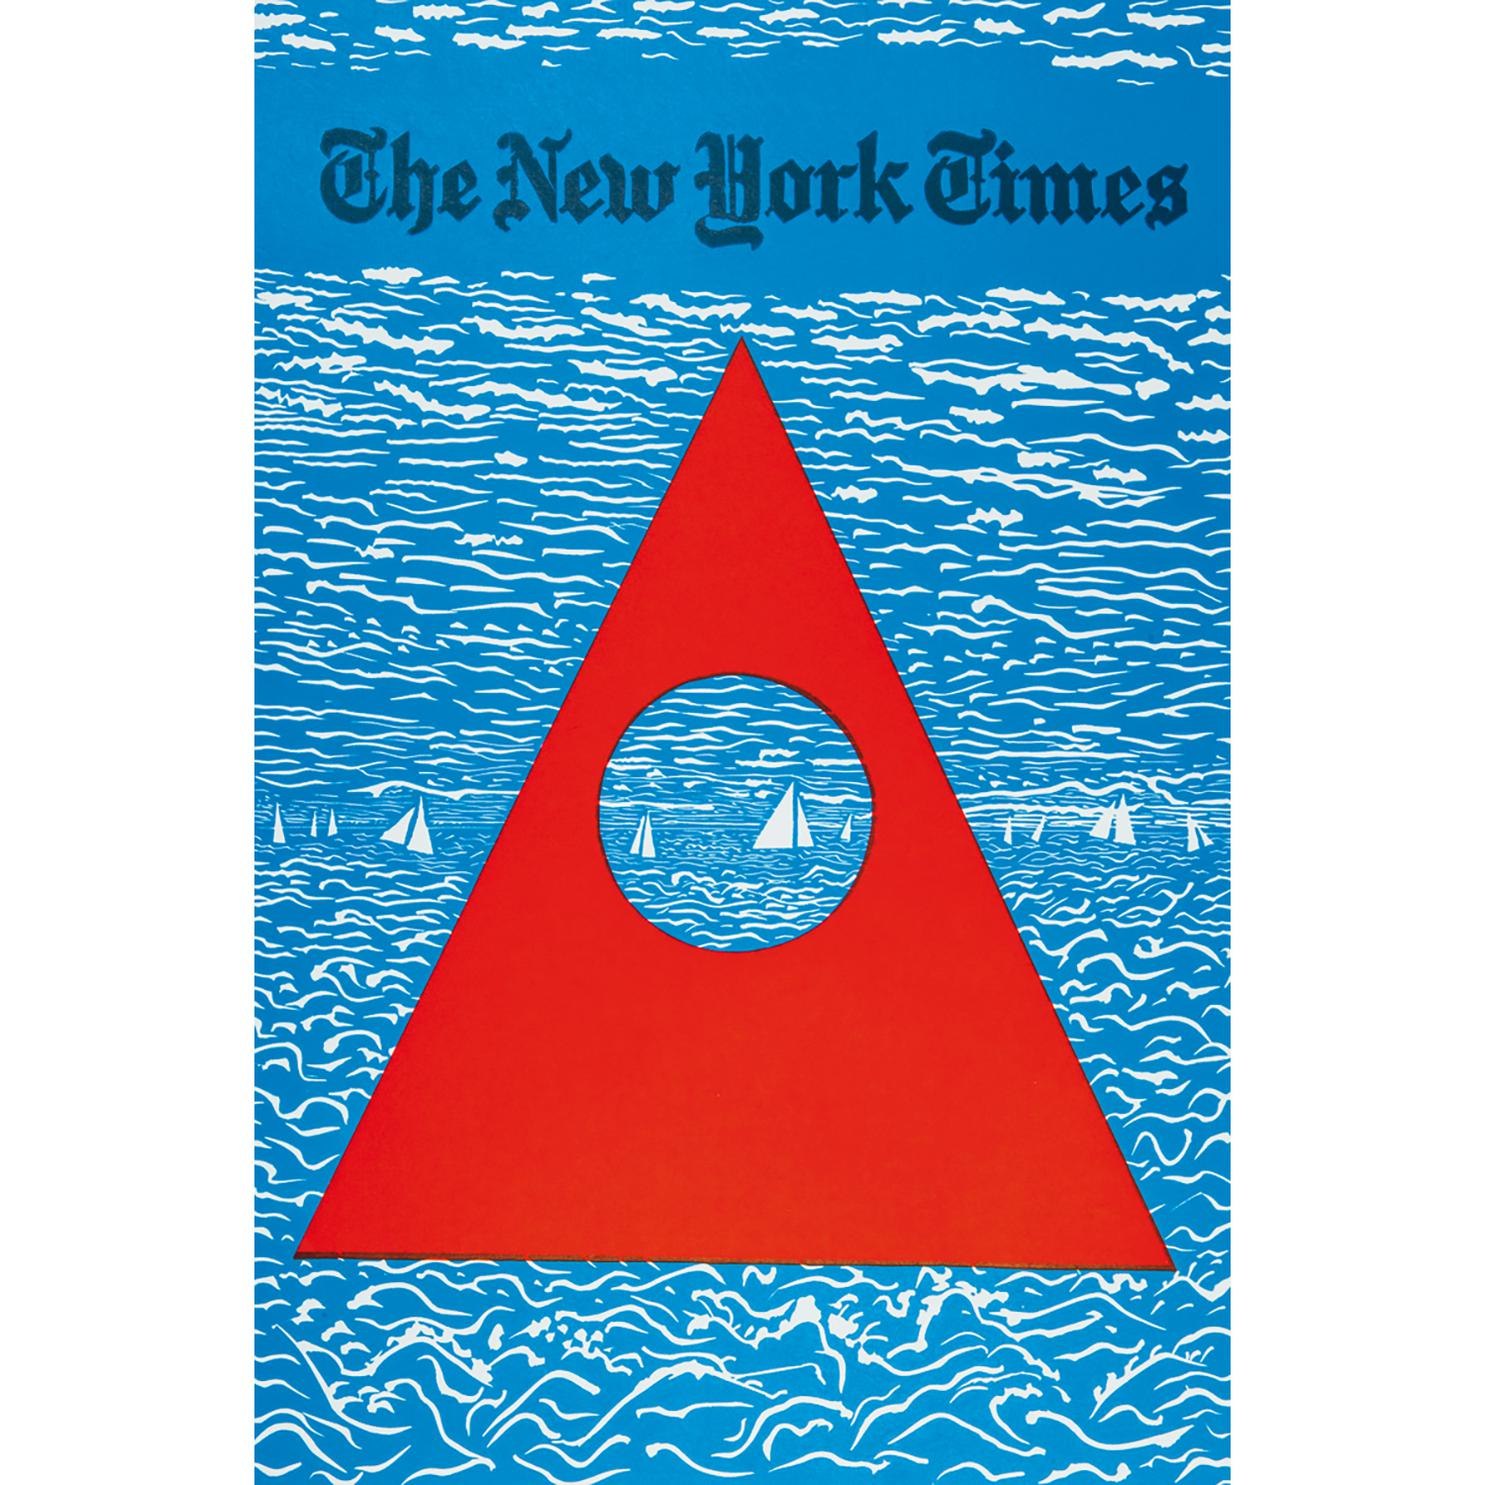 Derek Boshier-New York Times-1997